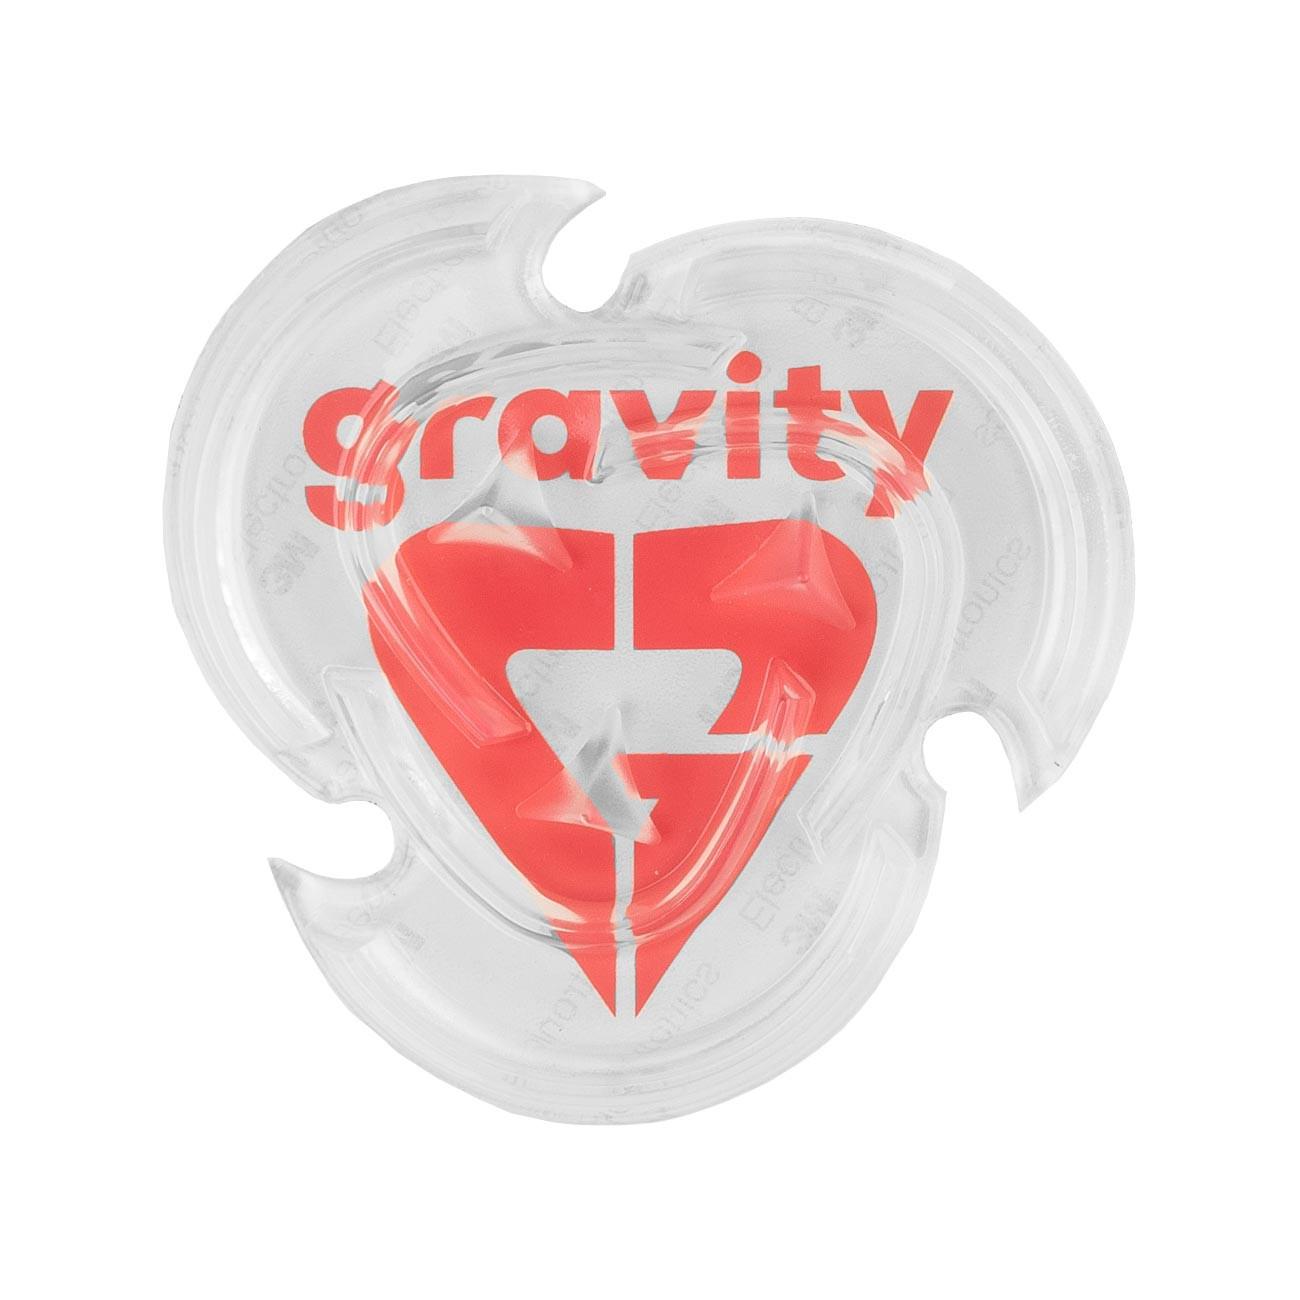 Grip GRAVITY HEART MAT CLEAR 18 19 - Velokram.cz b27ab6918d